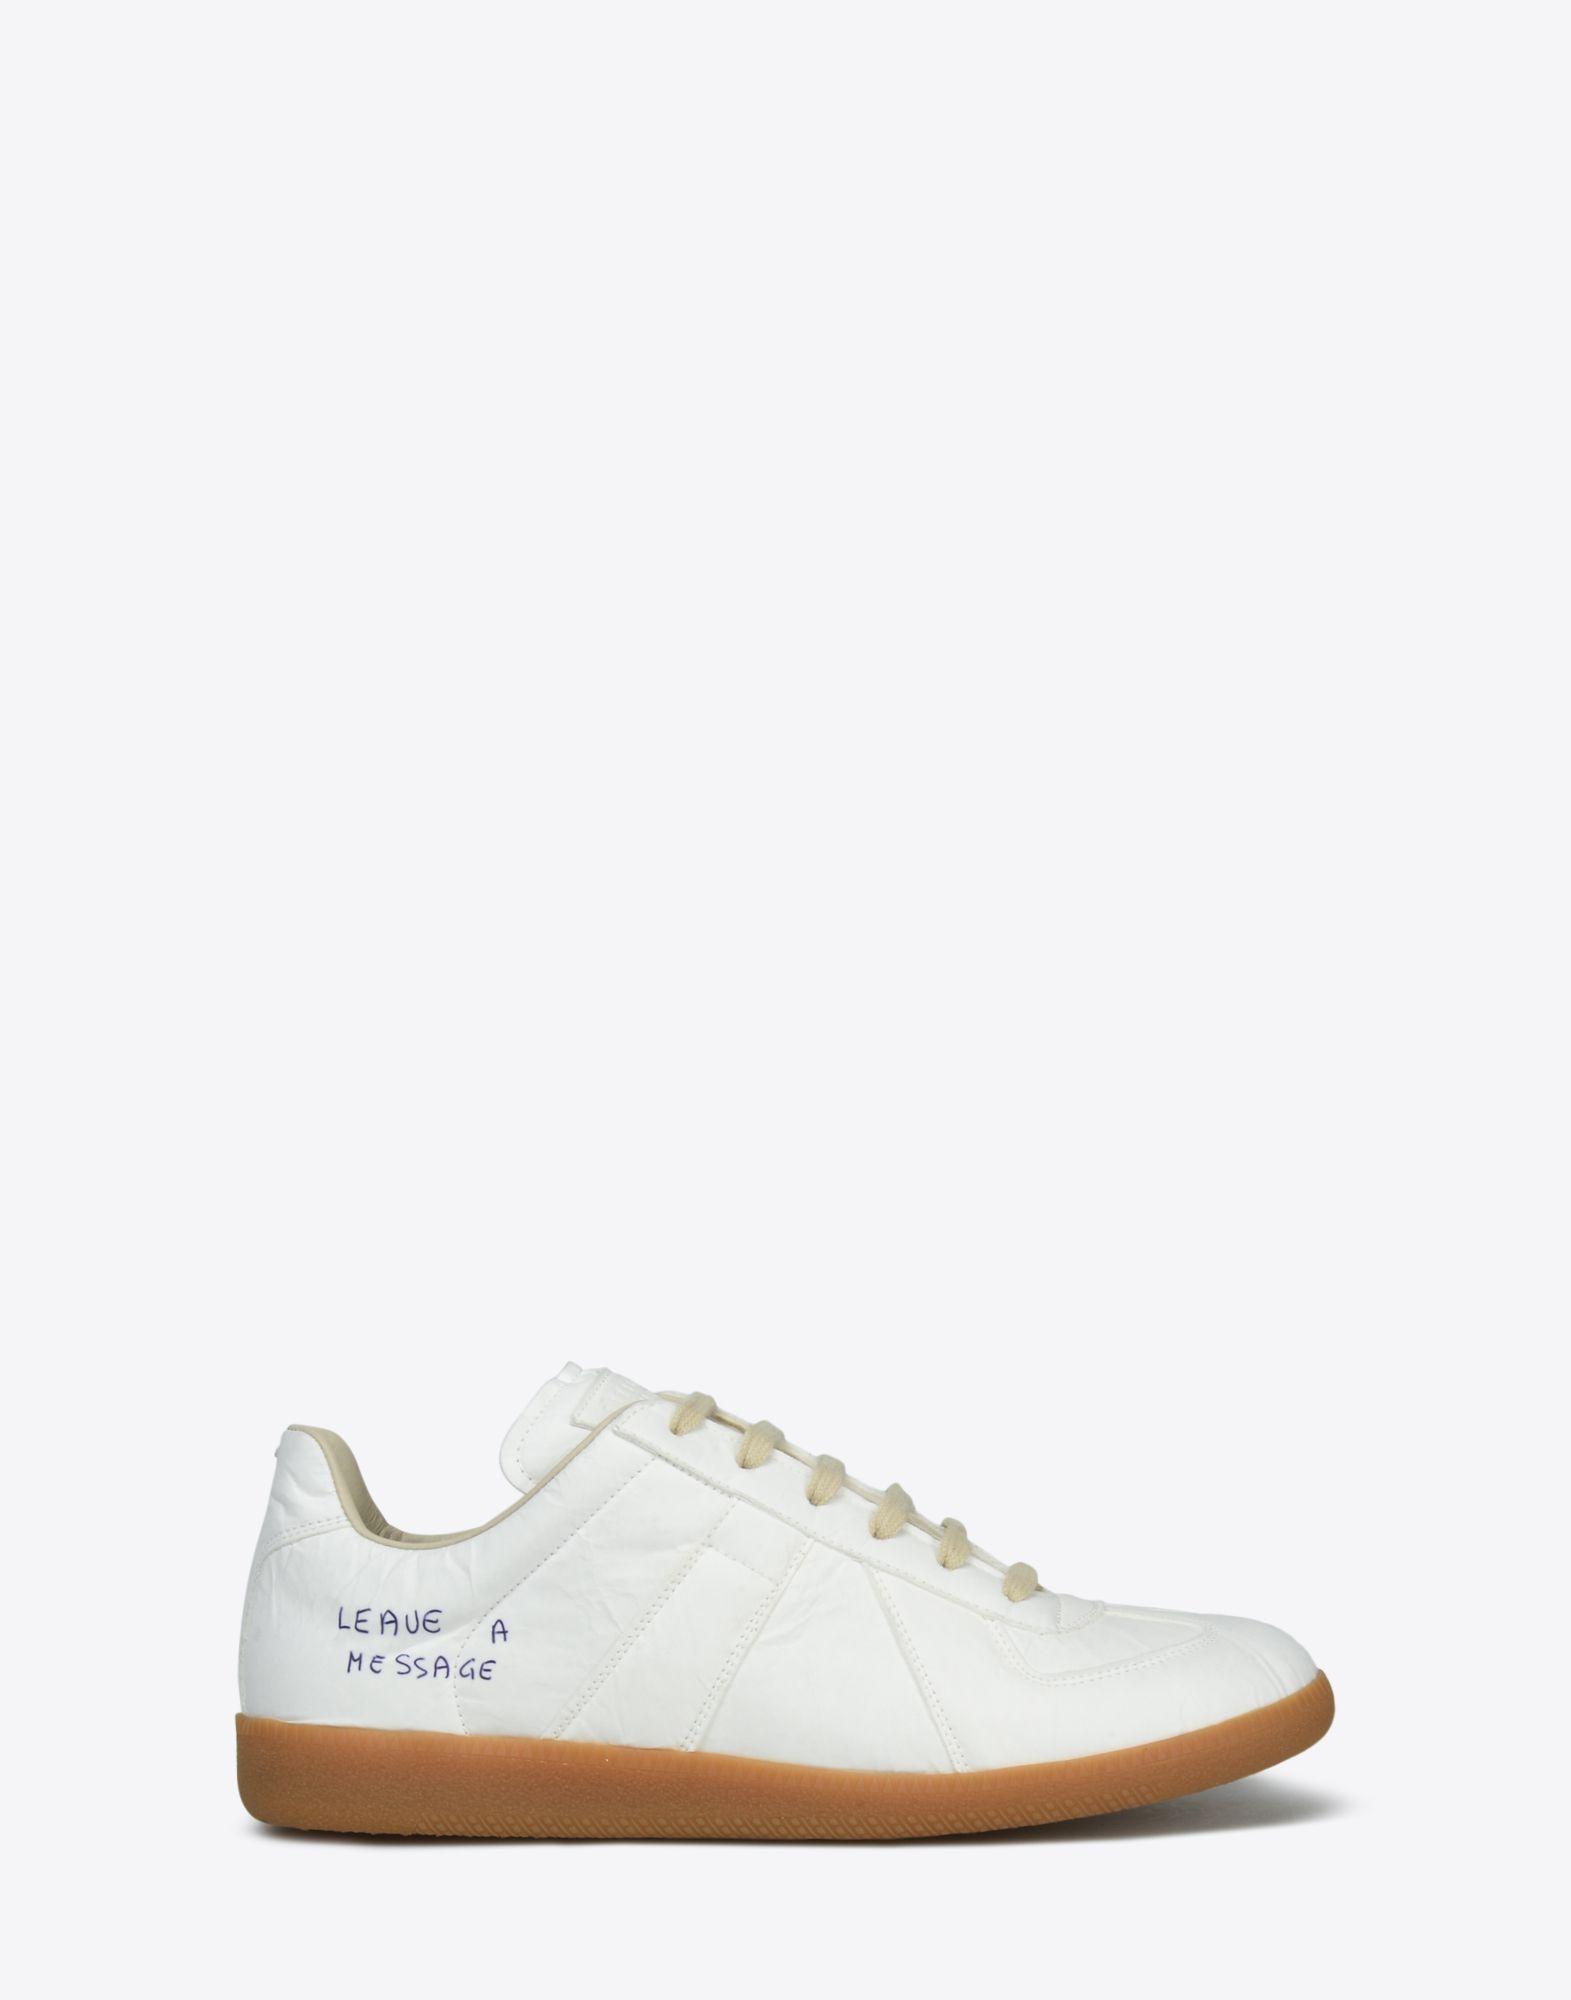 MAISON MARGIELA Sneakers «Replica» avec effet papier et stylo Sneakers Homme f